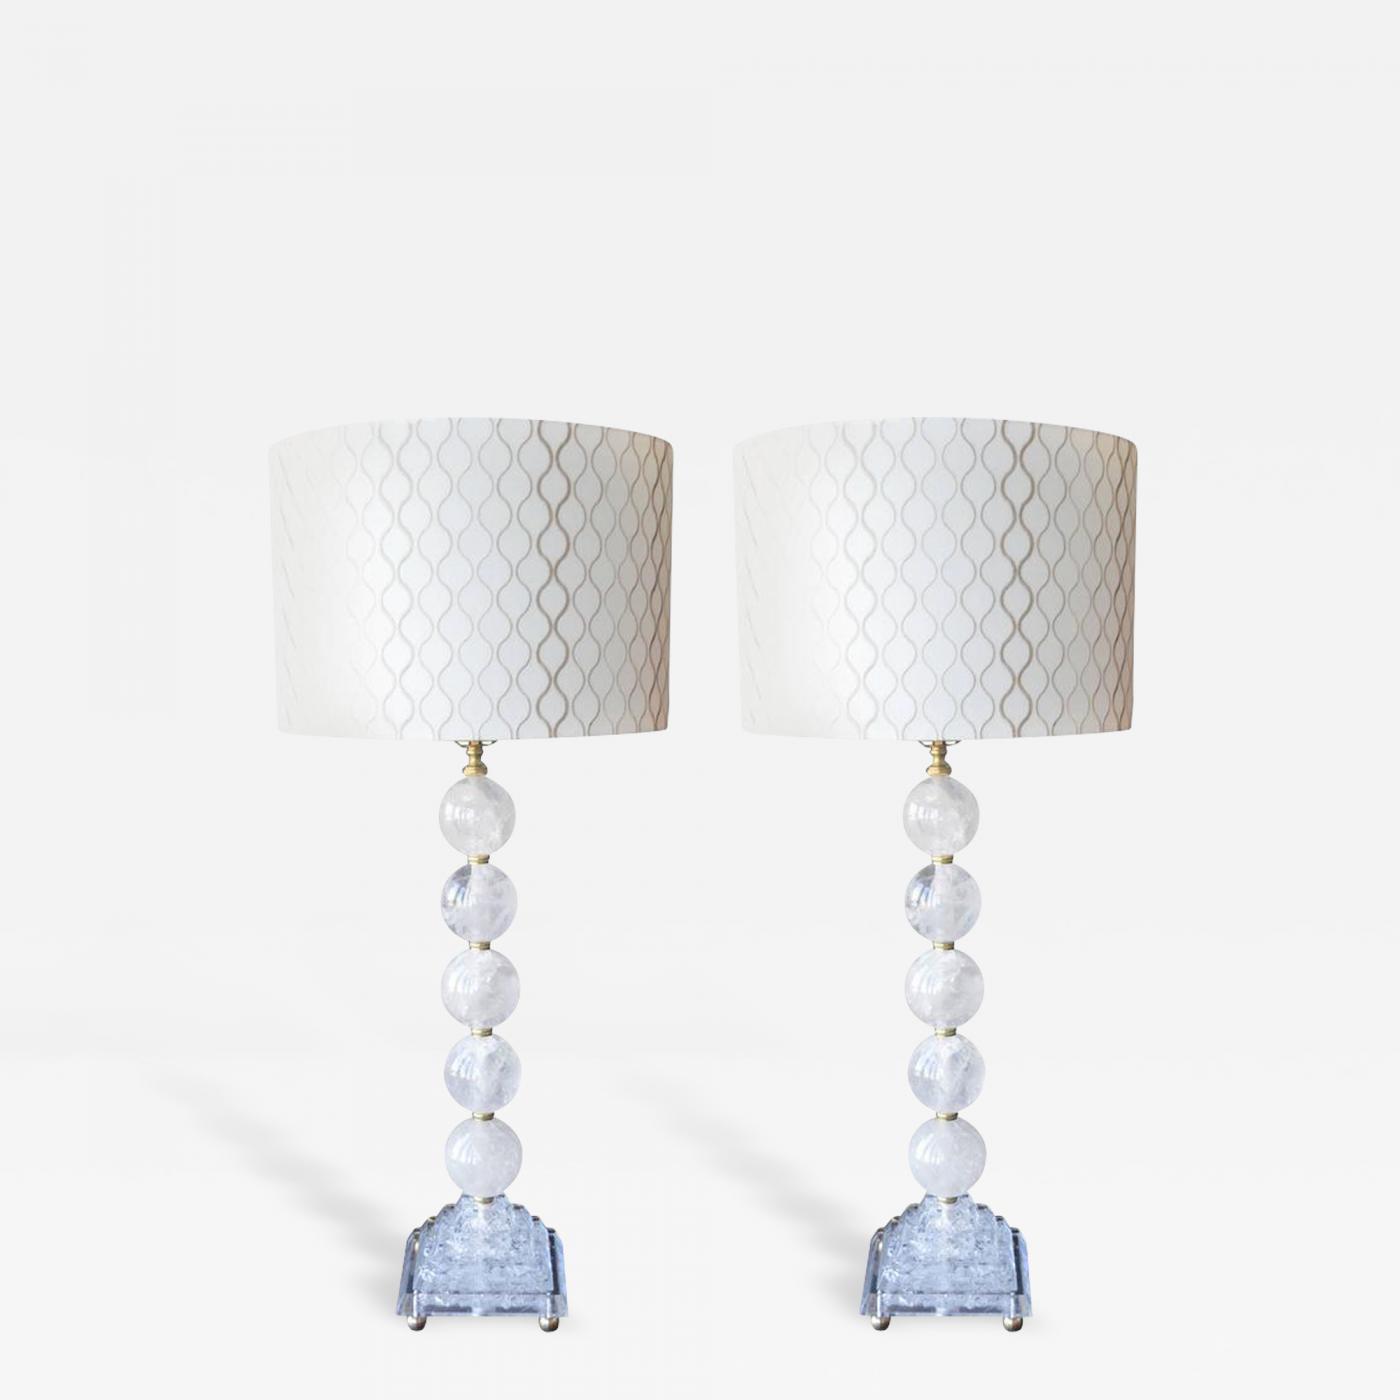 Pair of rock crystal table lamps listings furniture lighting table lamps pair of rock crystal mozeypictures Gallery